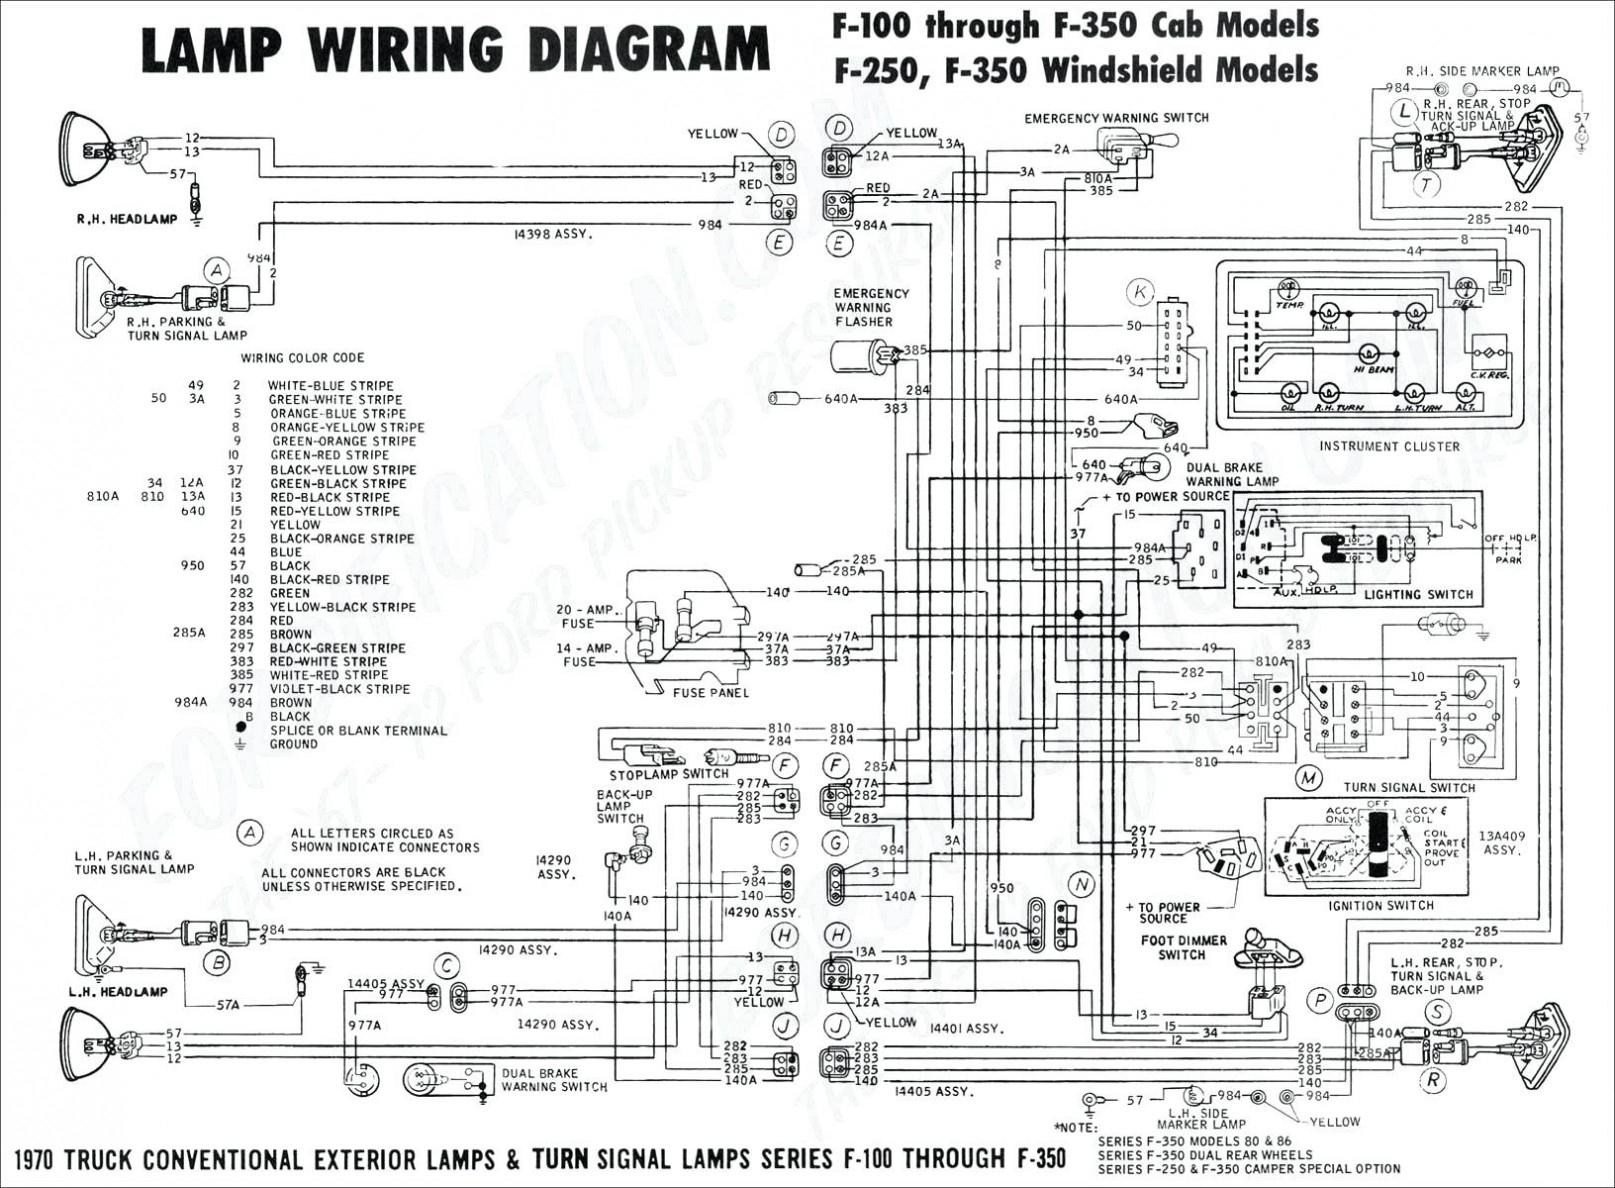 Tiffin Motorhome Wiring Diagram Winnebago Lovely Amazing - Winnebago Motorhome Wiring Diagram